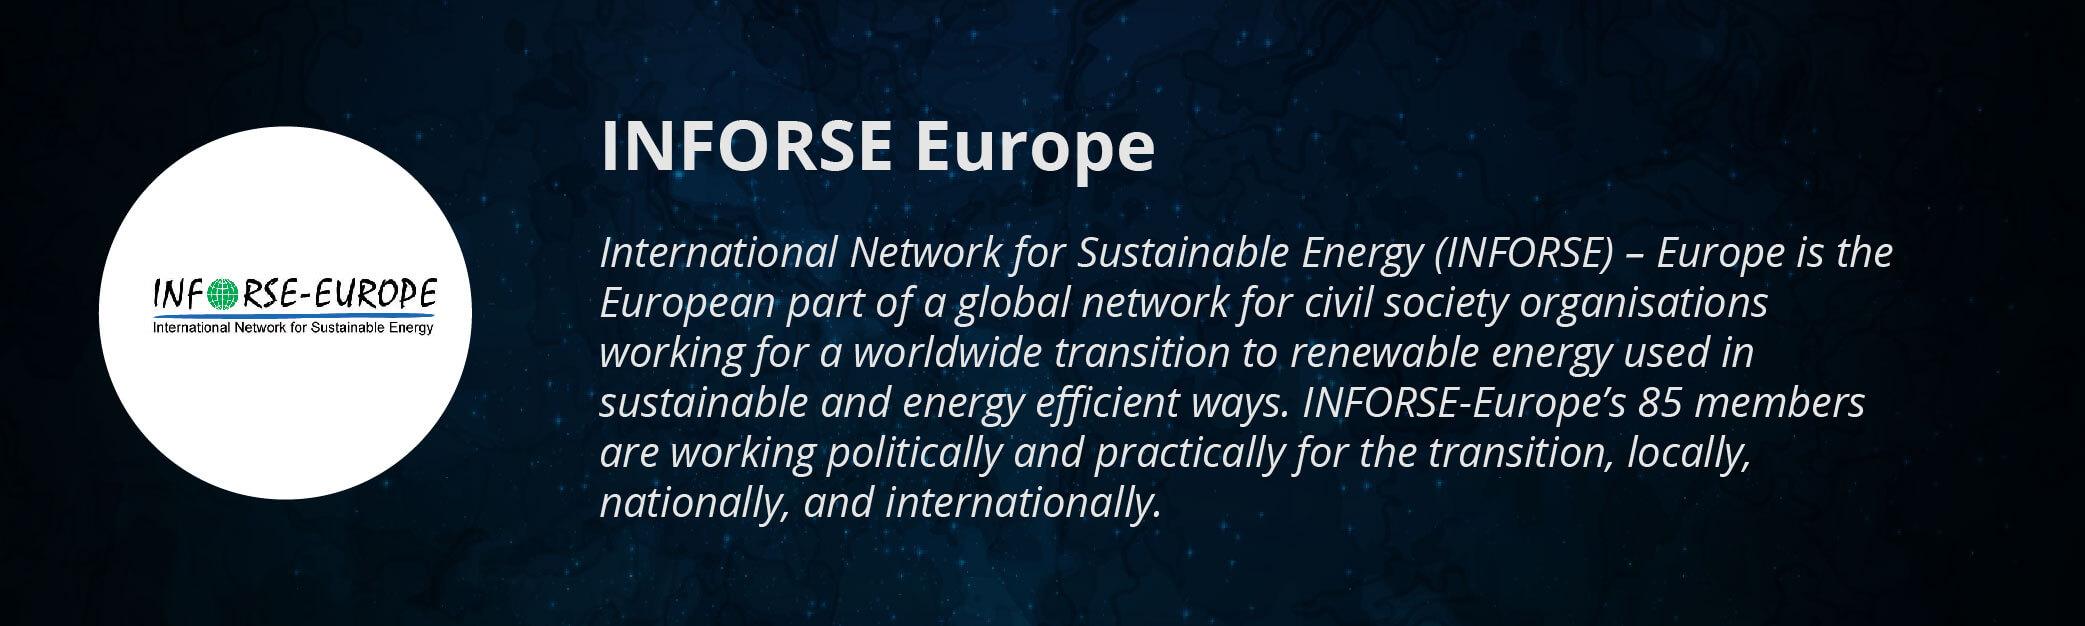 INFORSE Europe